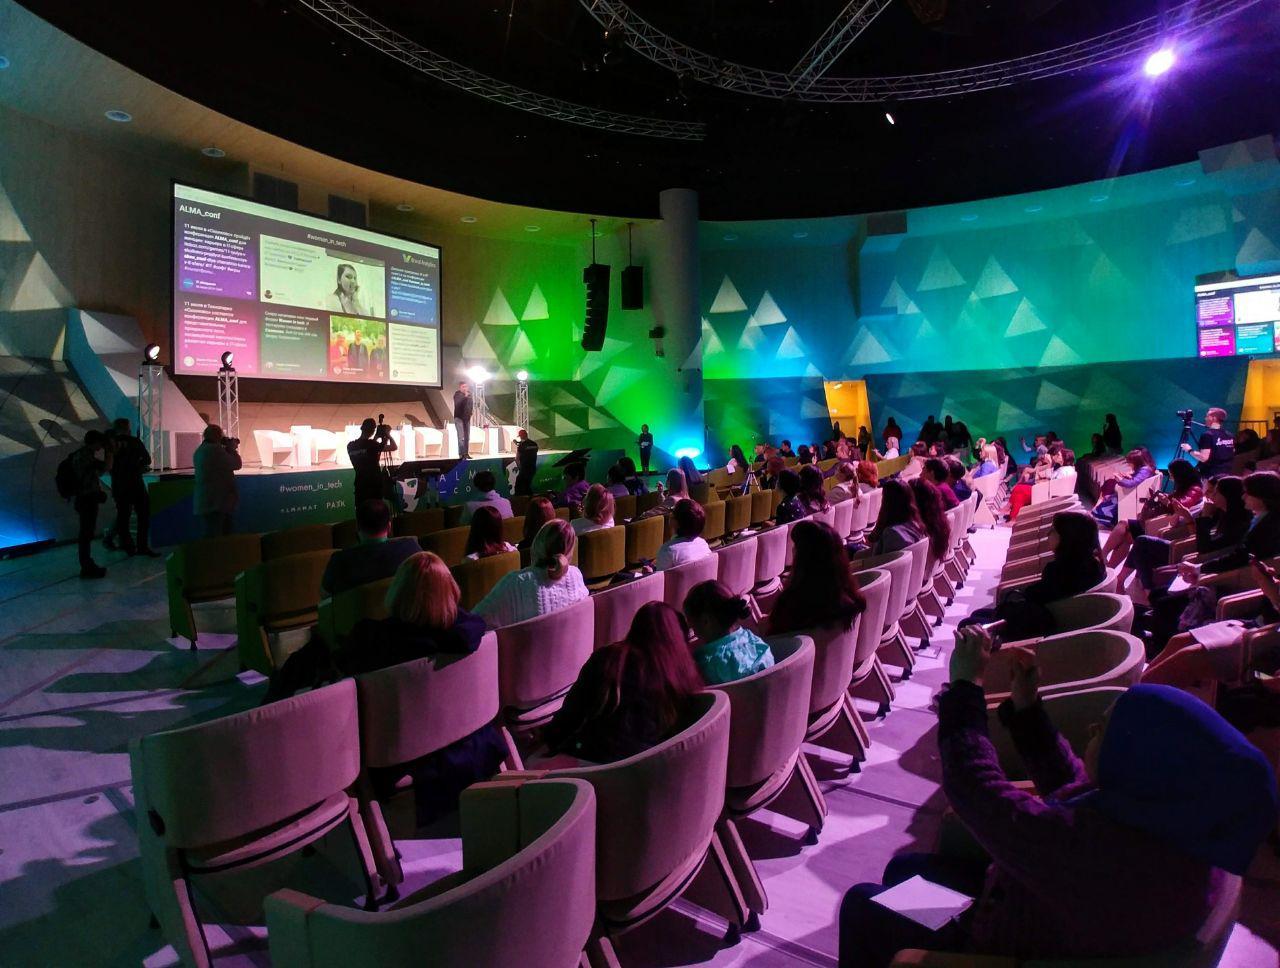 Event-Wall - соцмедиа-дашборд для мероприятий от Brand-Analytics